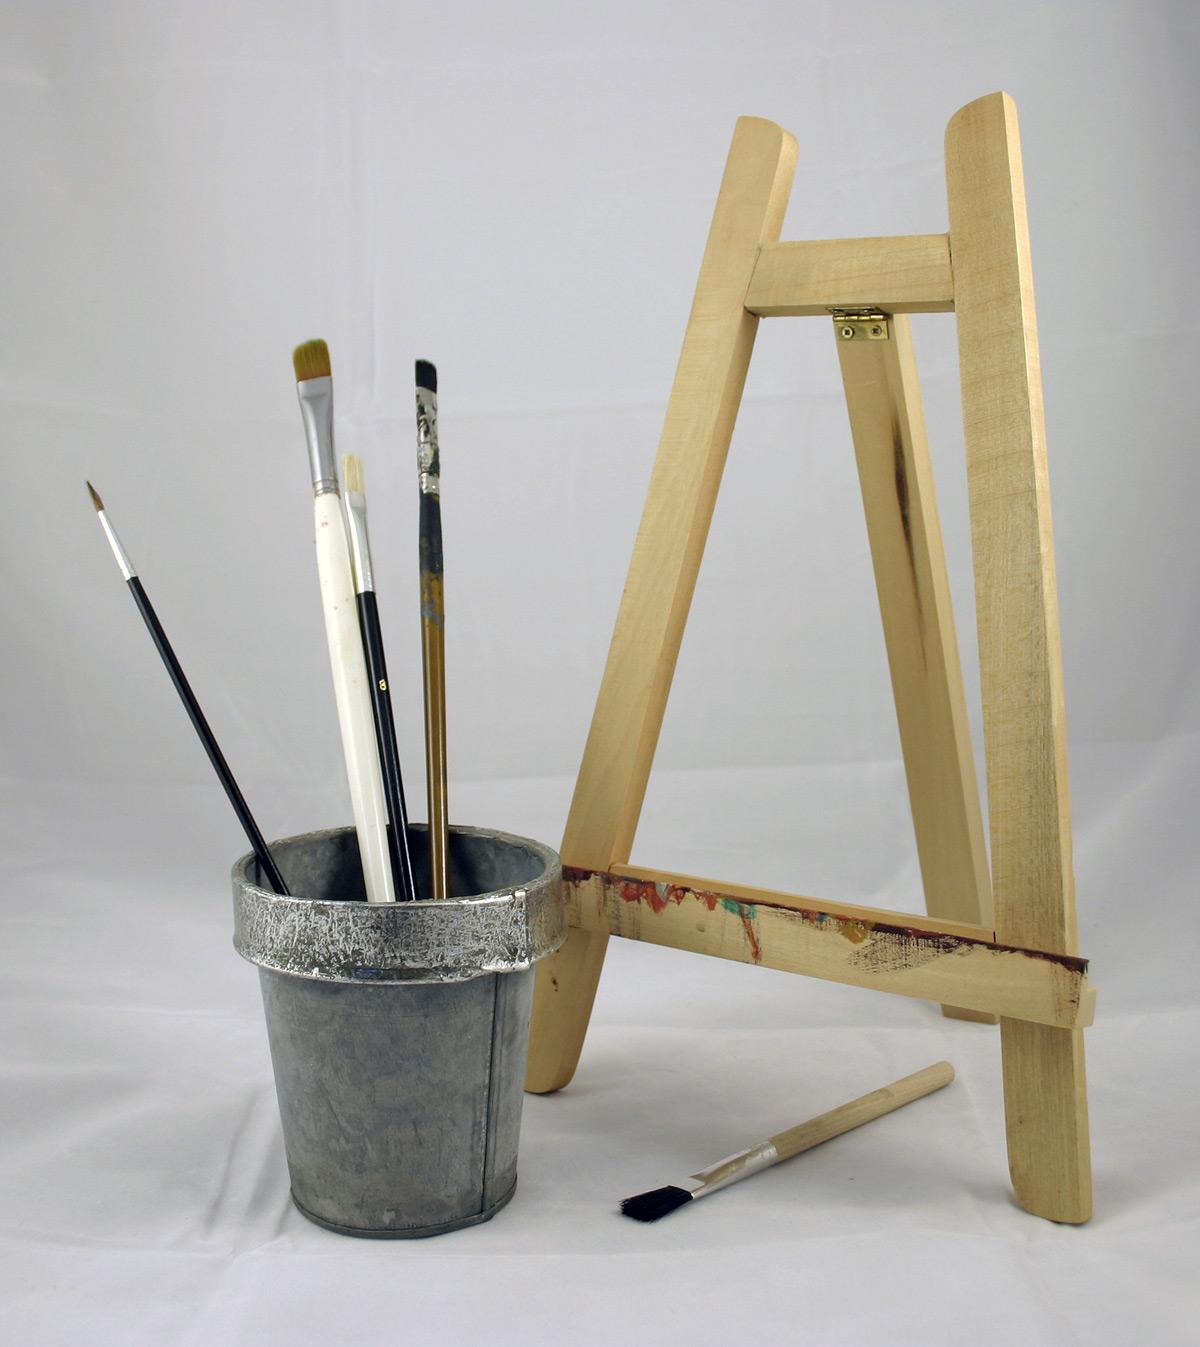 Painting set, Art, Brush, Craft, Display, HQ Photo